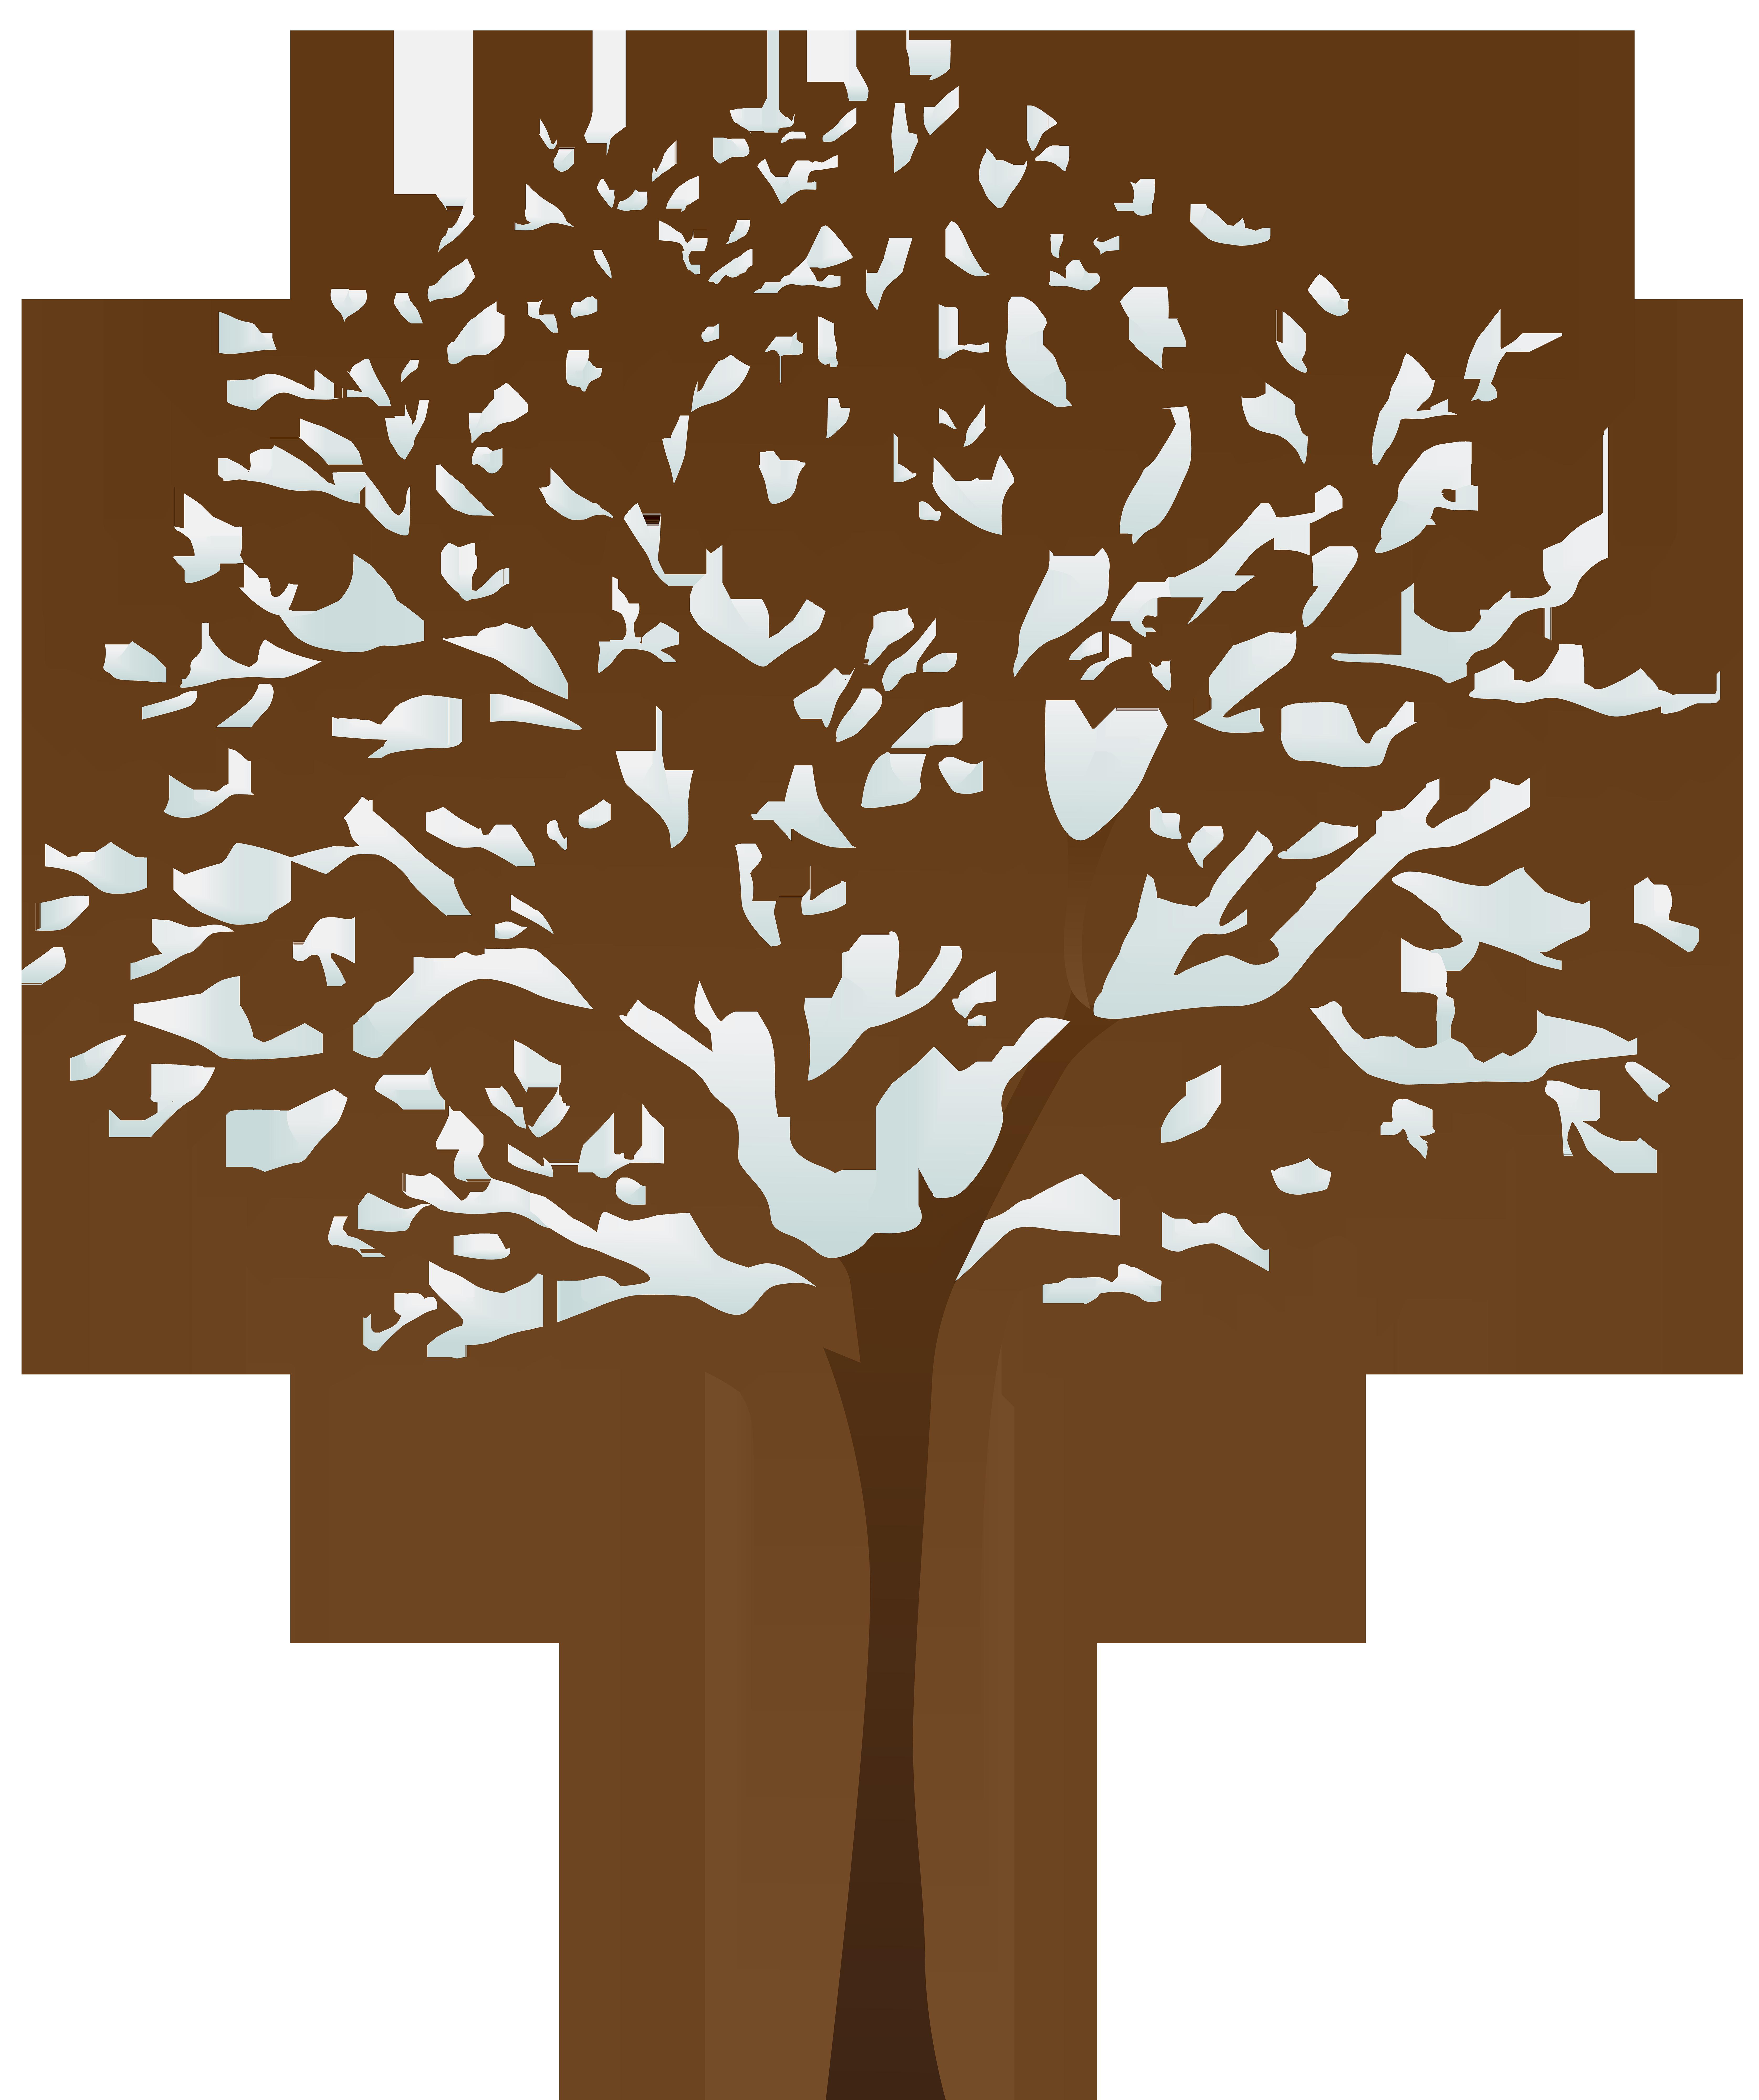 6700x8000 Snowy Winter Tree Transparent Png Imageu200b Gallery Yopriceville